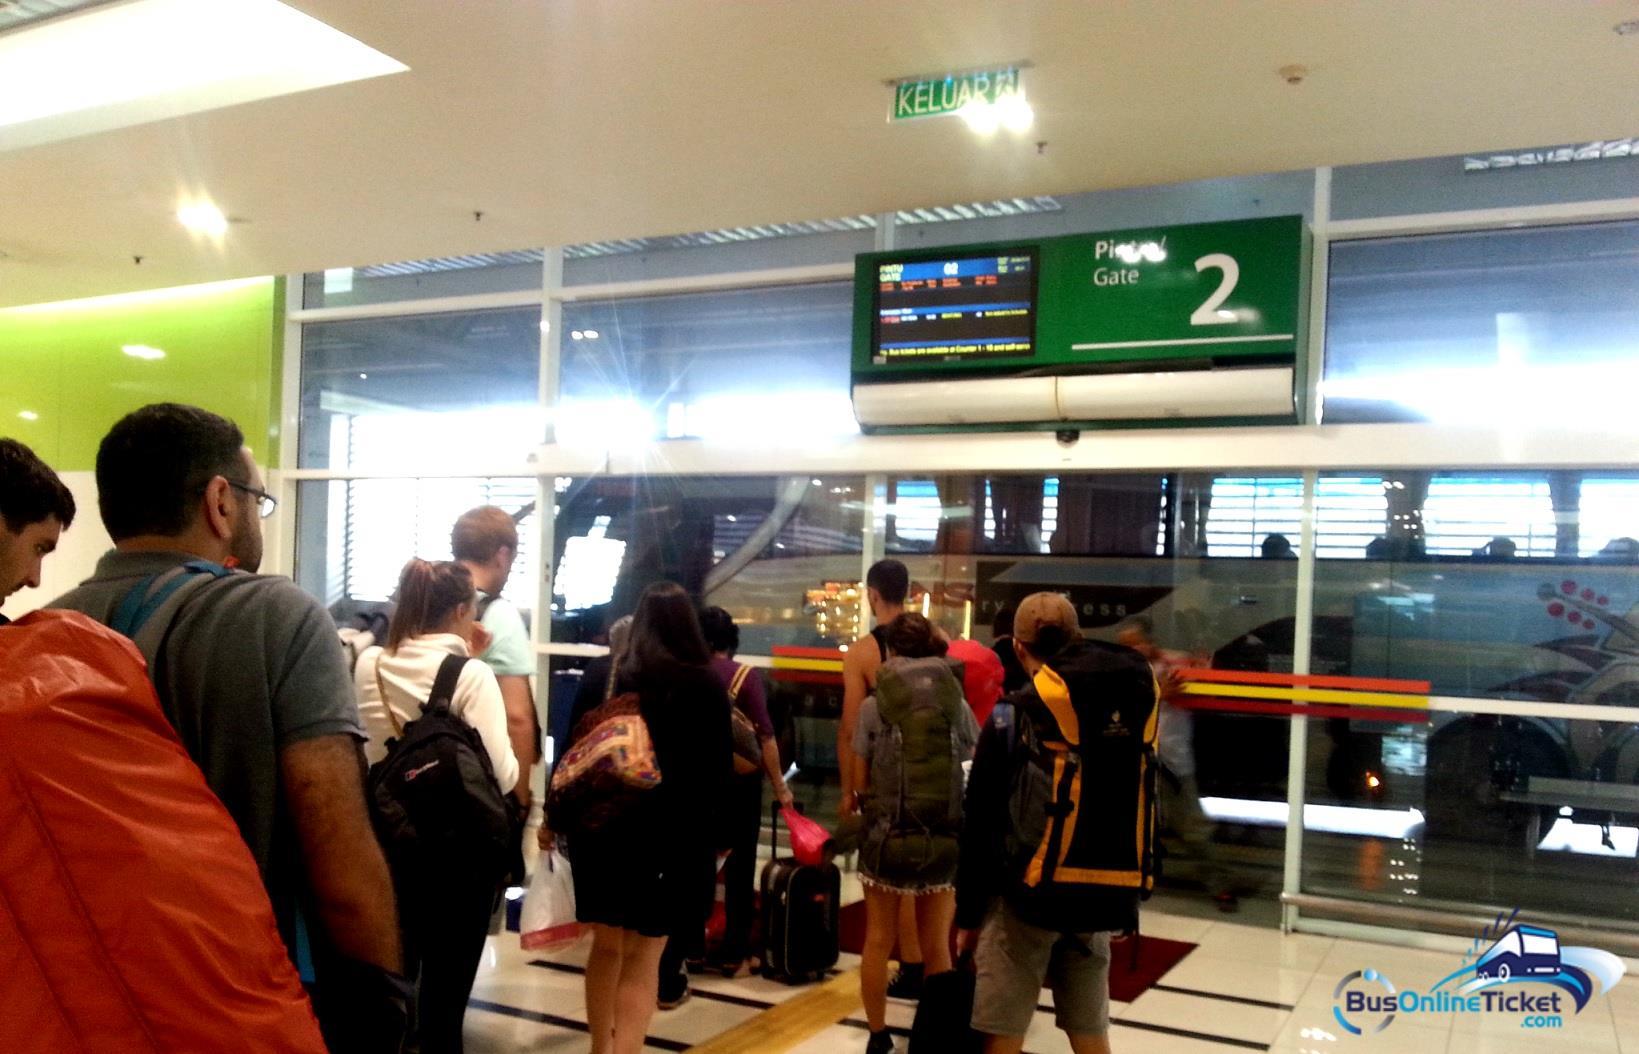 TBS Gate 2